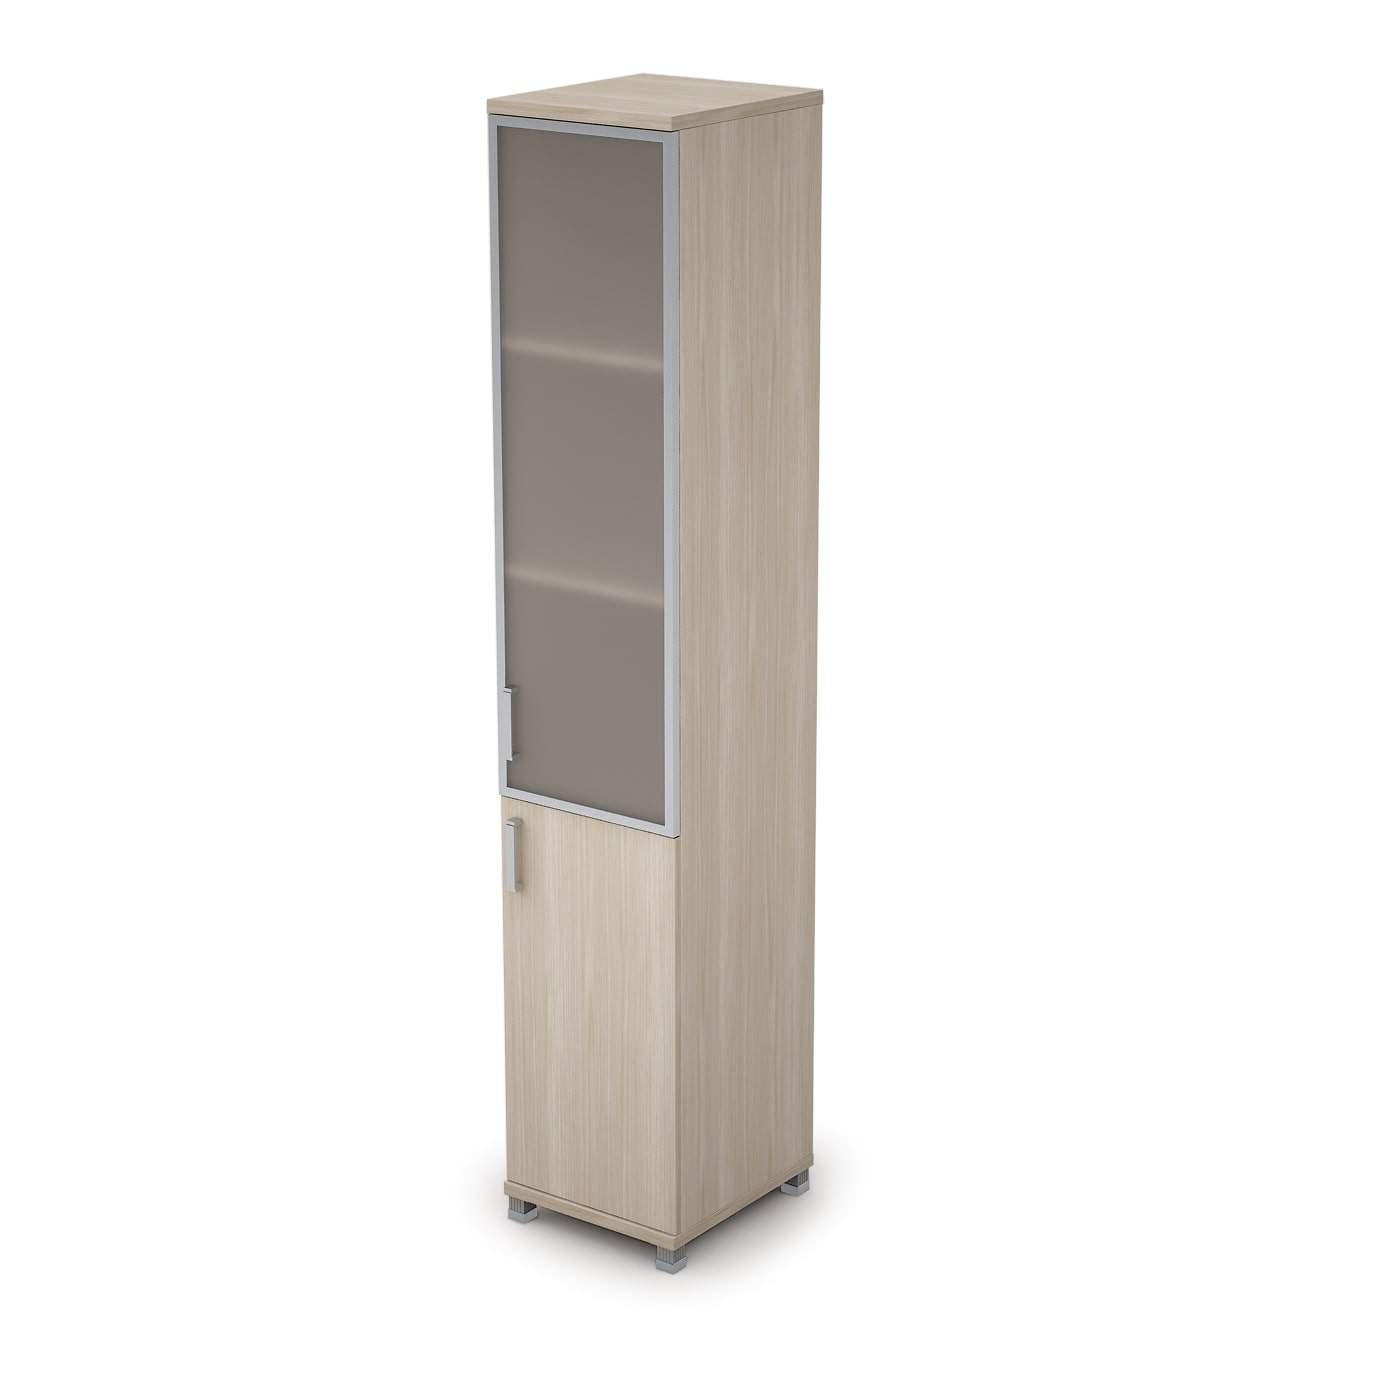 Шкаф узкий комбинированный 400x450x2116